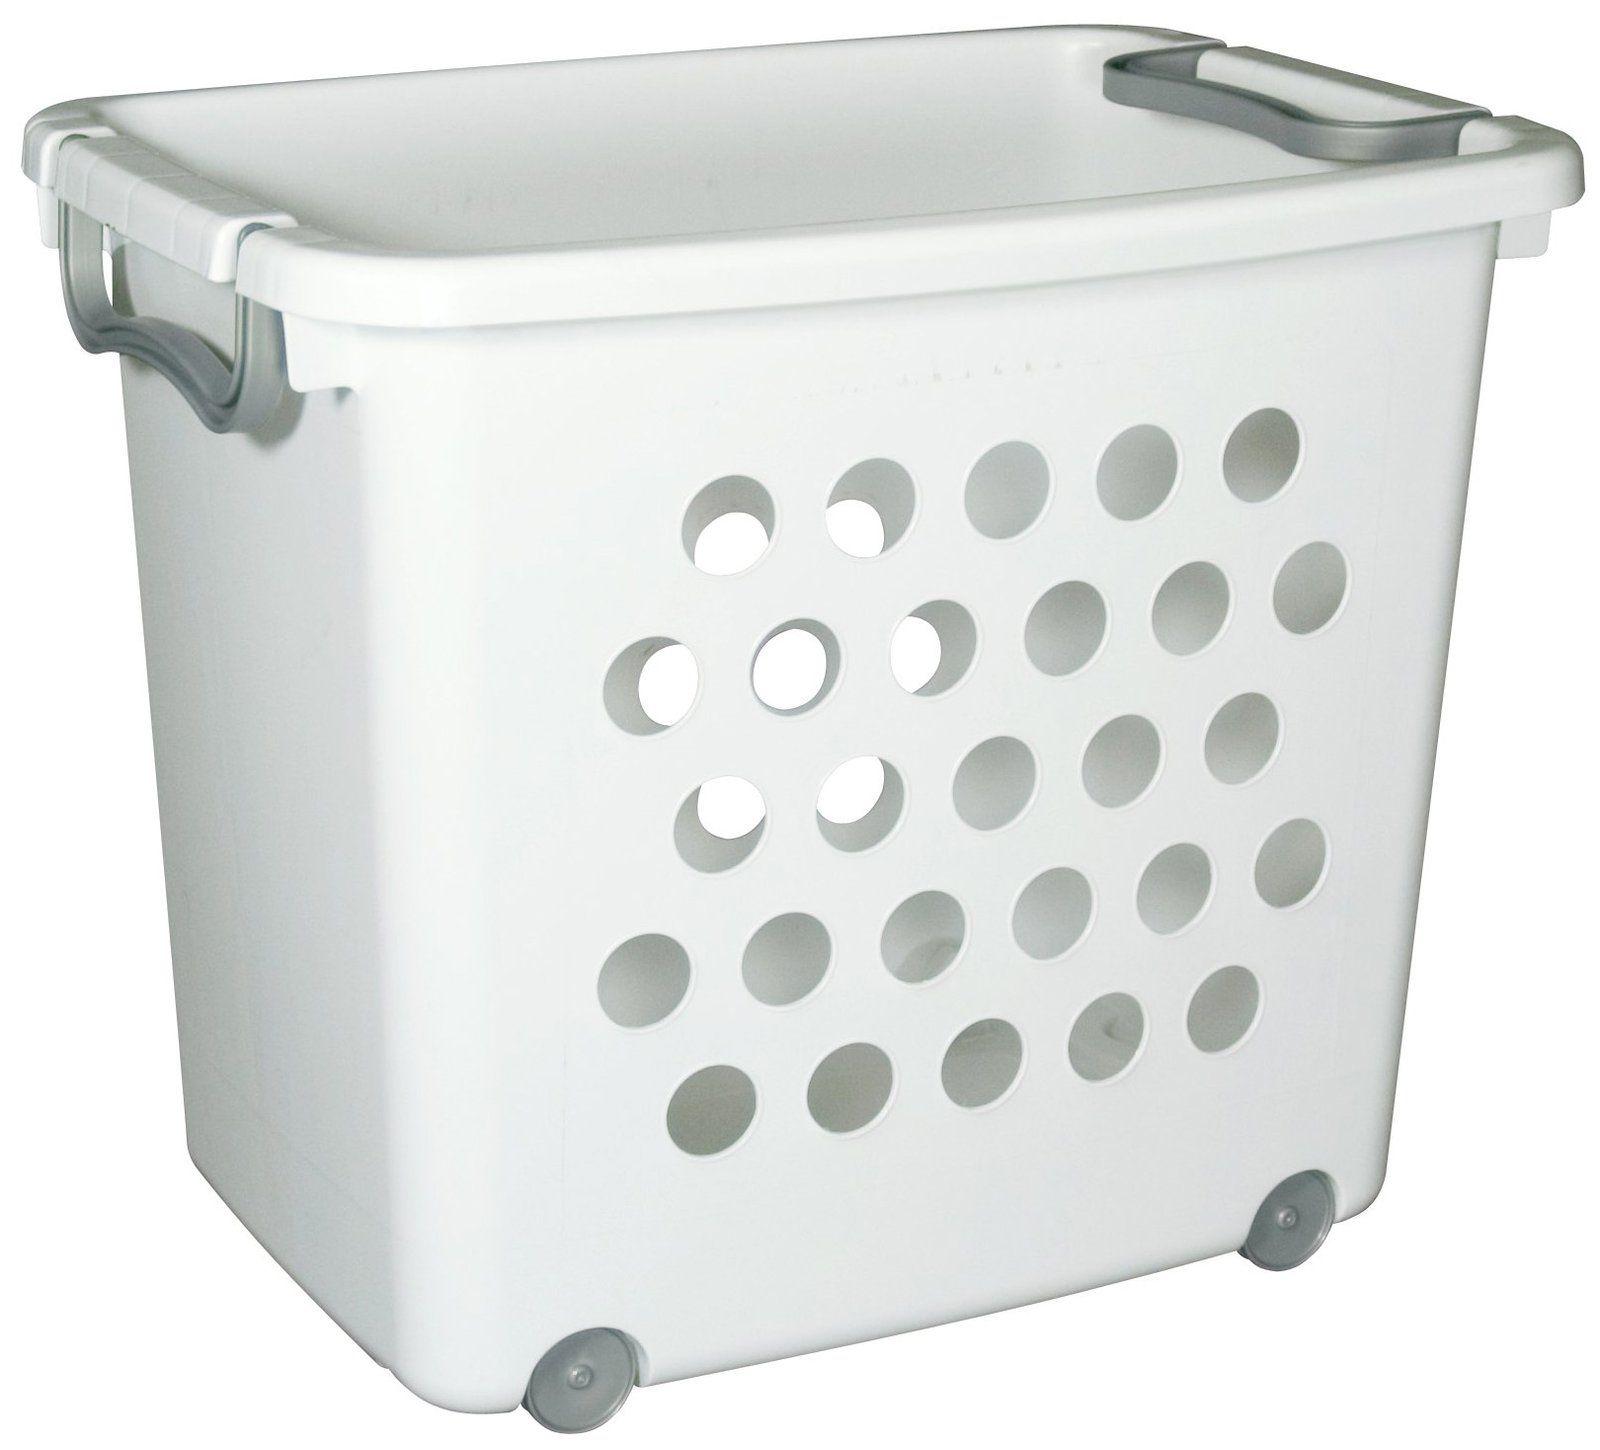 Sterilite Large Wheeled Stacking Basket Stacking Basket Storage Baskets Toy Storage Baskets